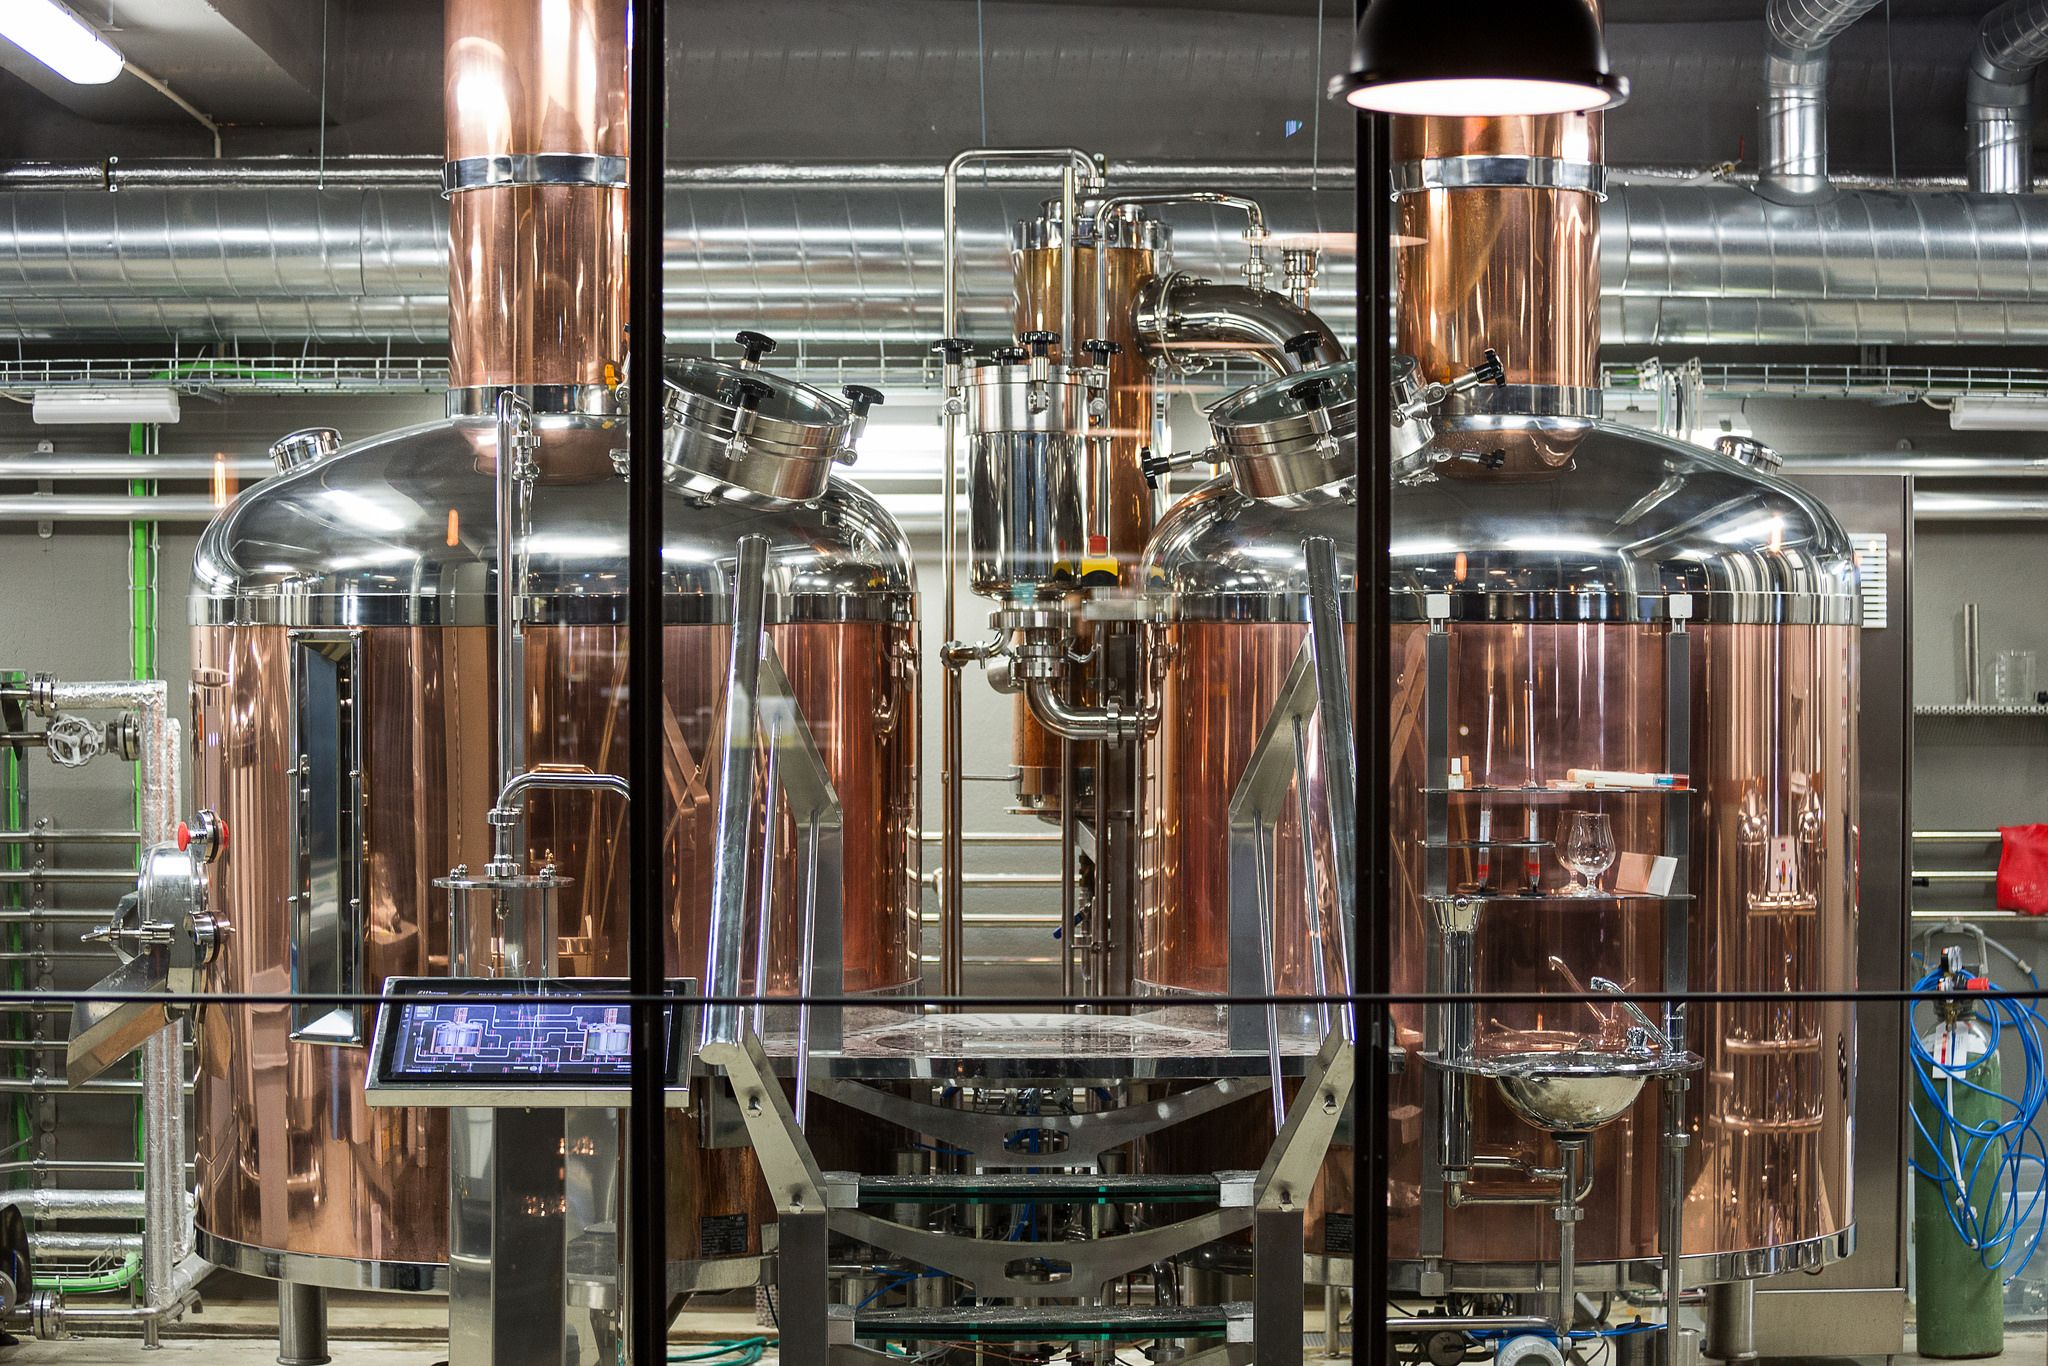 High tech micro-brewing equipment in Reykjavik